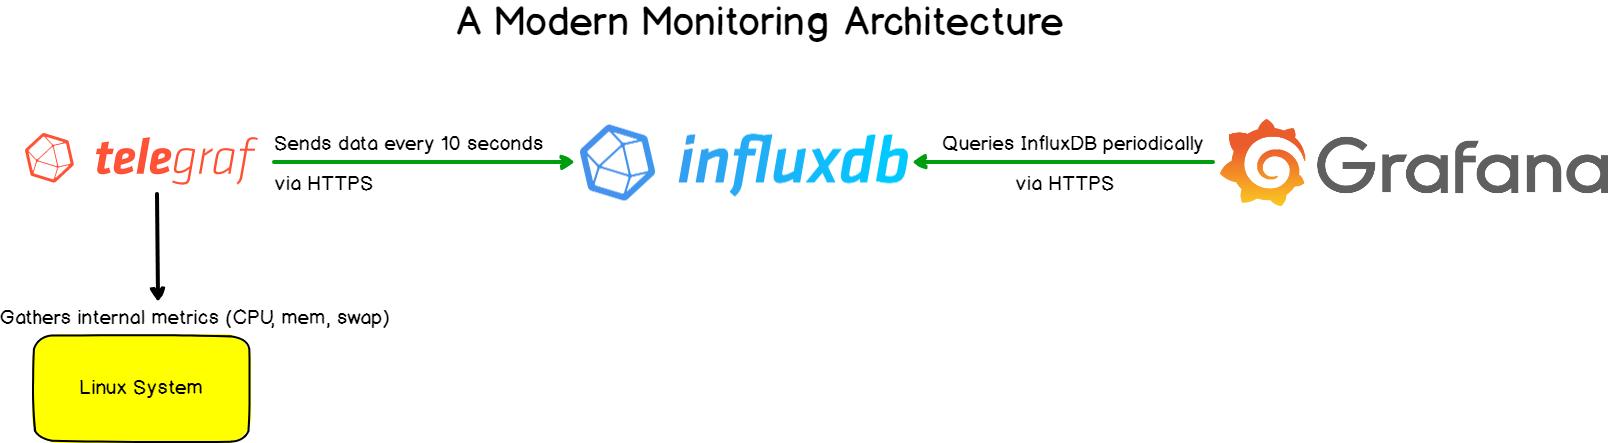 modern-monitoring-architecture